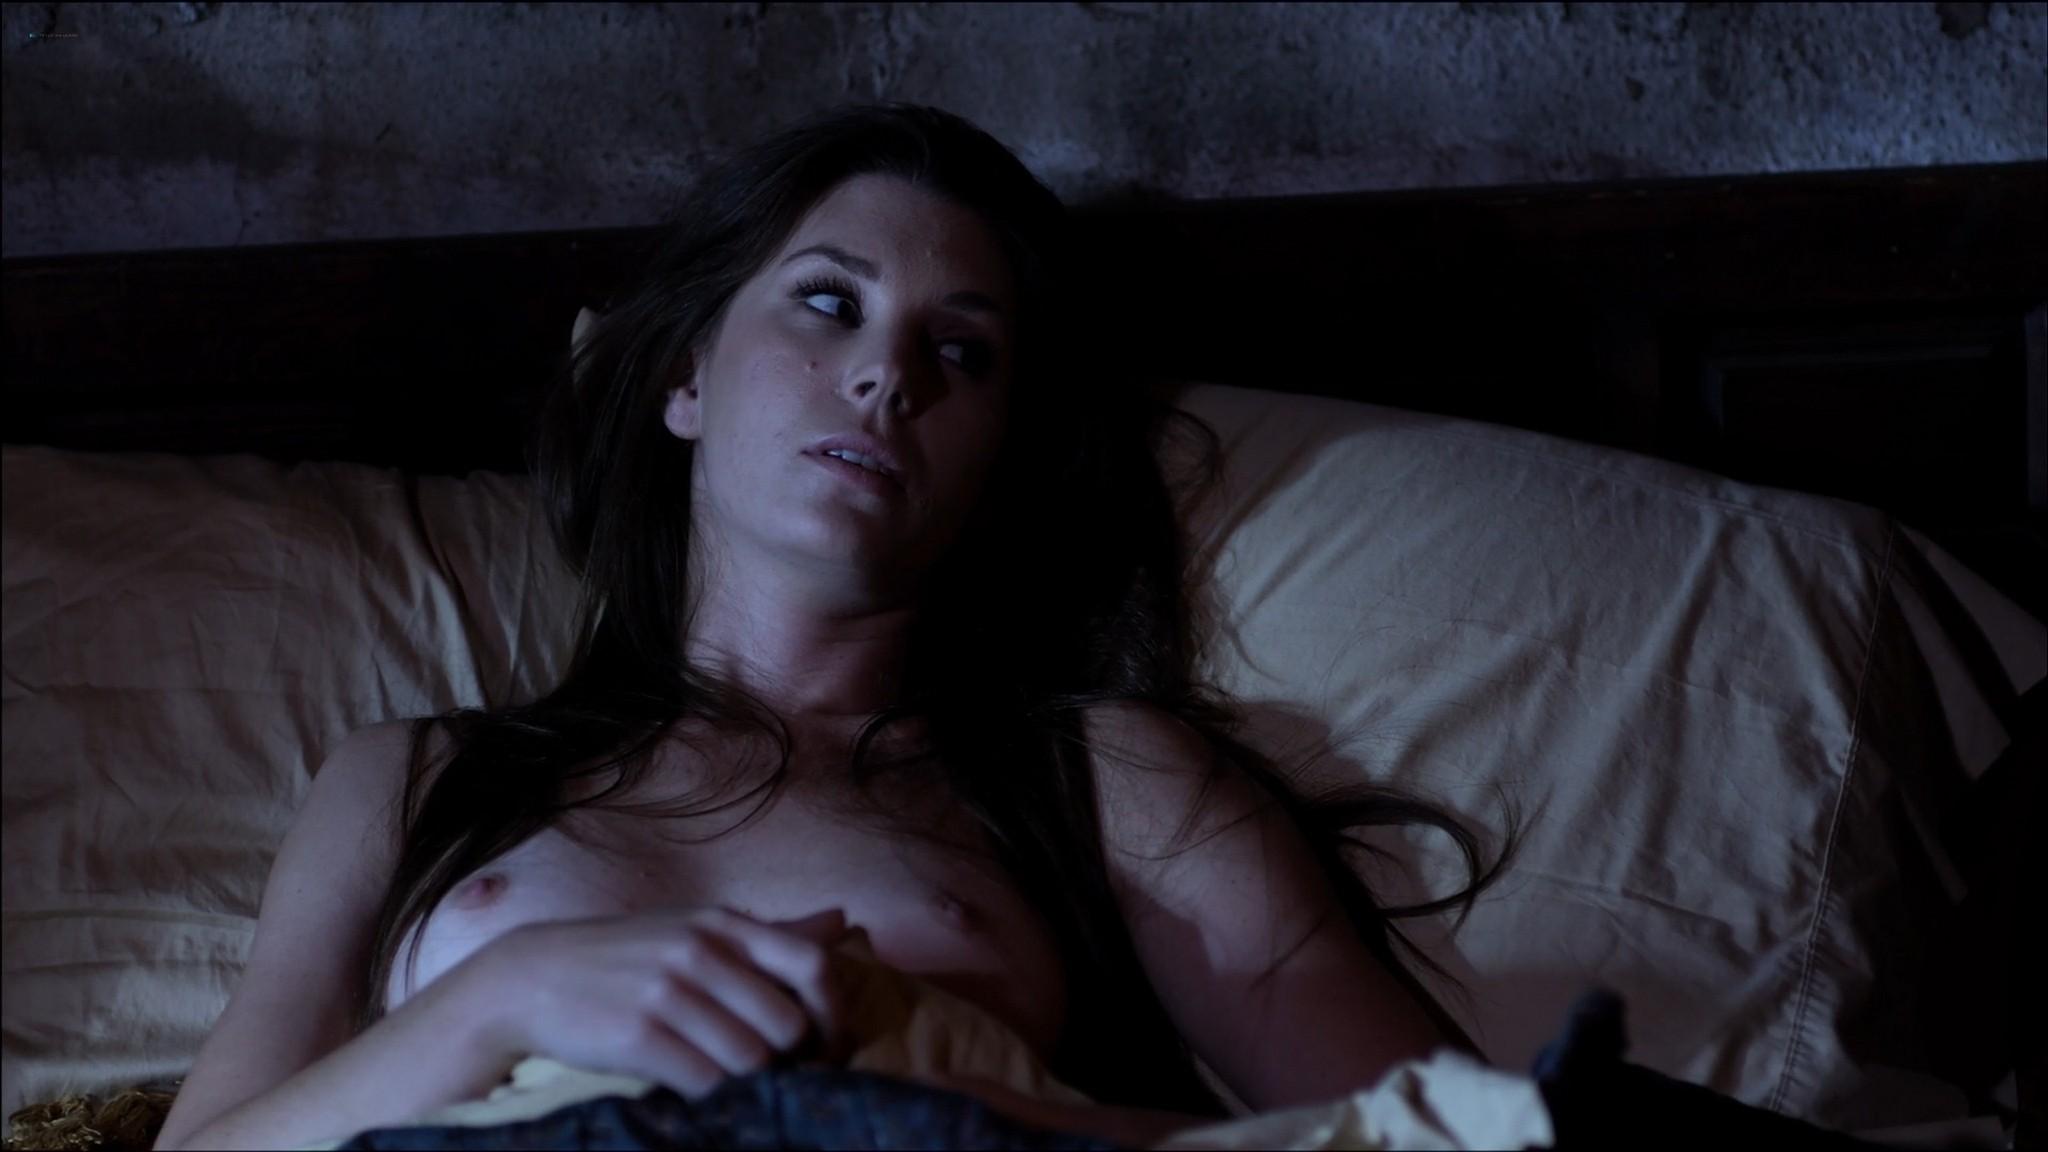 Mindy Robinson see through Christina Collard nude Dracula The Impaler 2013 1080p BluRay 7